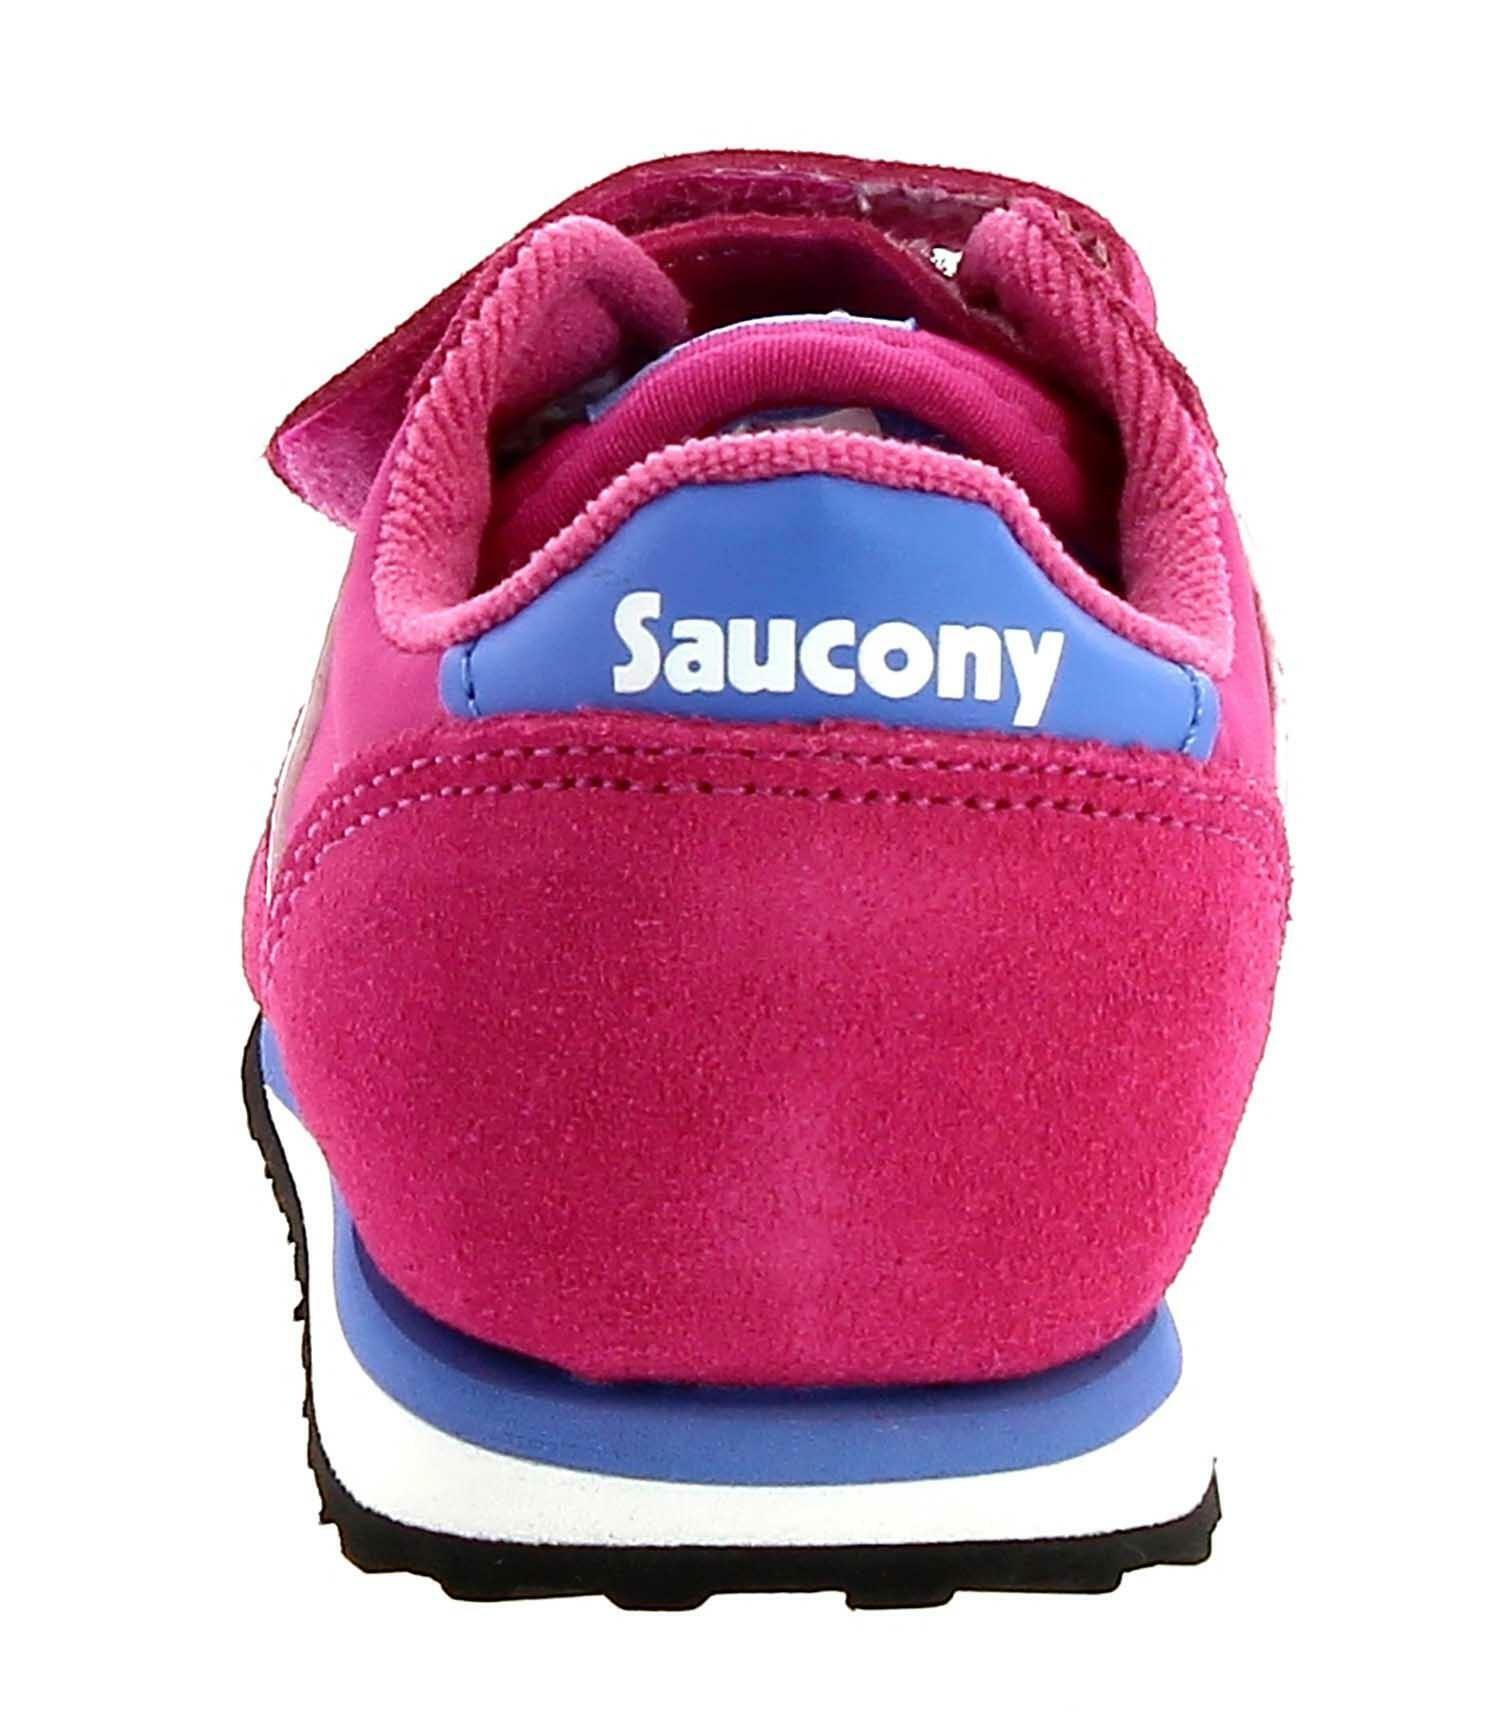 saucony saucony jazz scarpe sportive bambina viola strappo sl159643